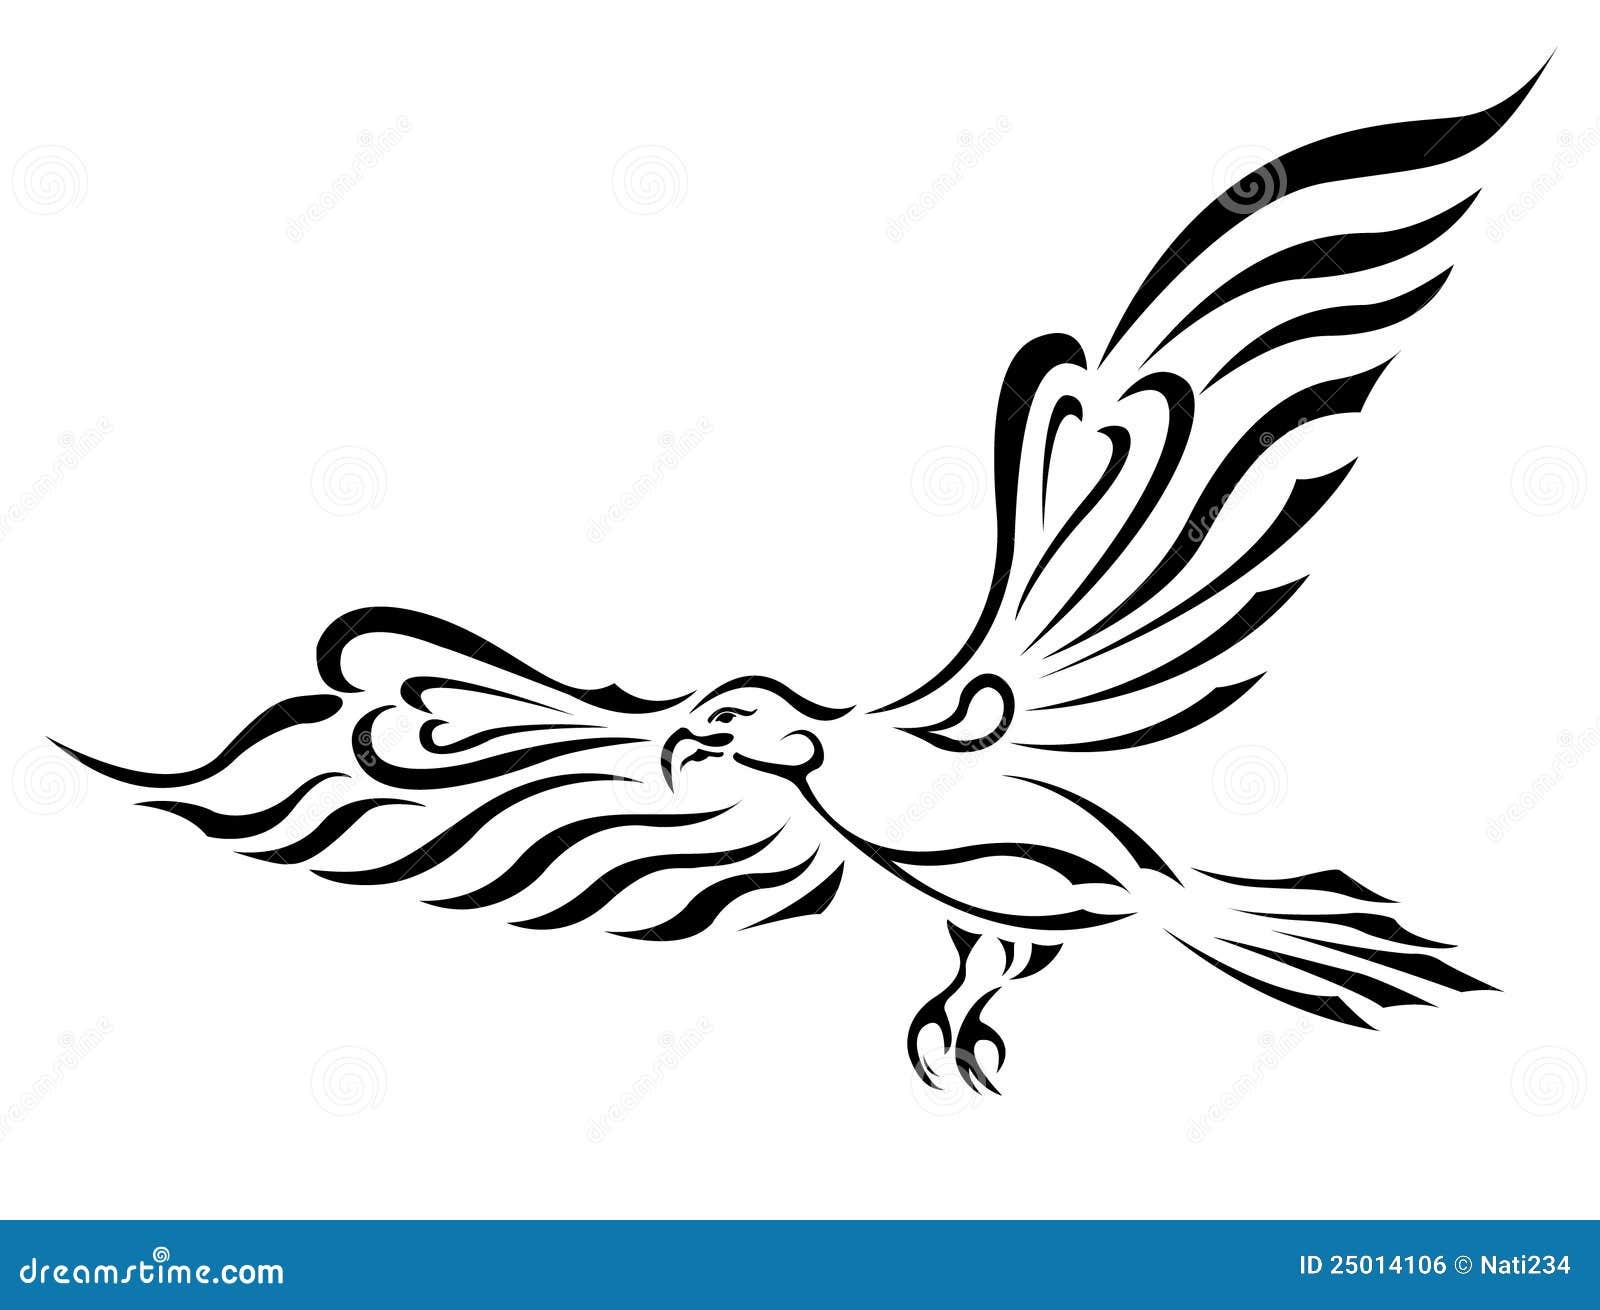 Tatouage De Symbole De Liberte Aigle De Vol Avec De Grandes Ailes